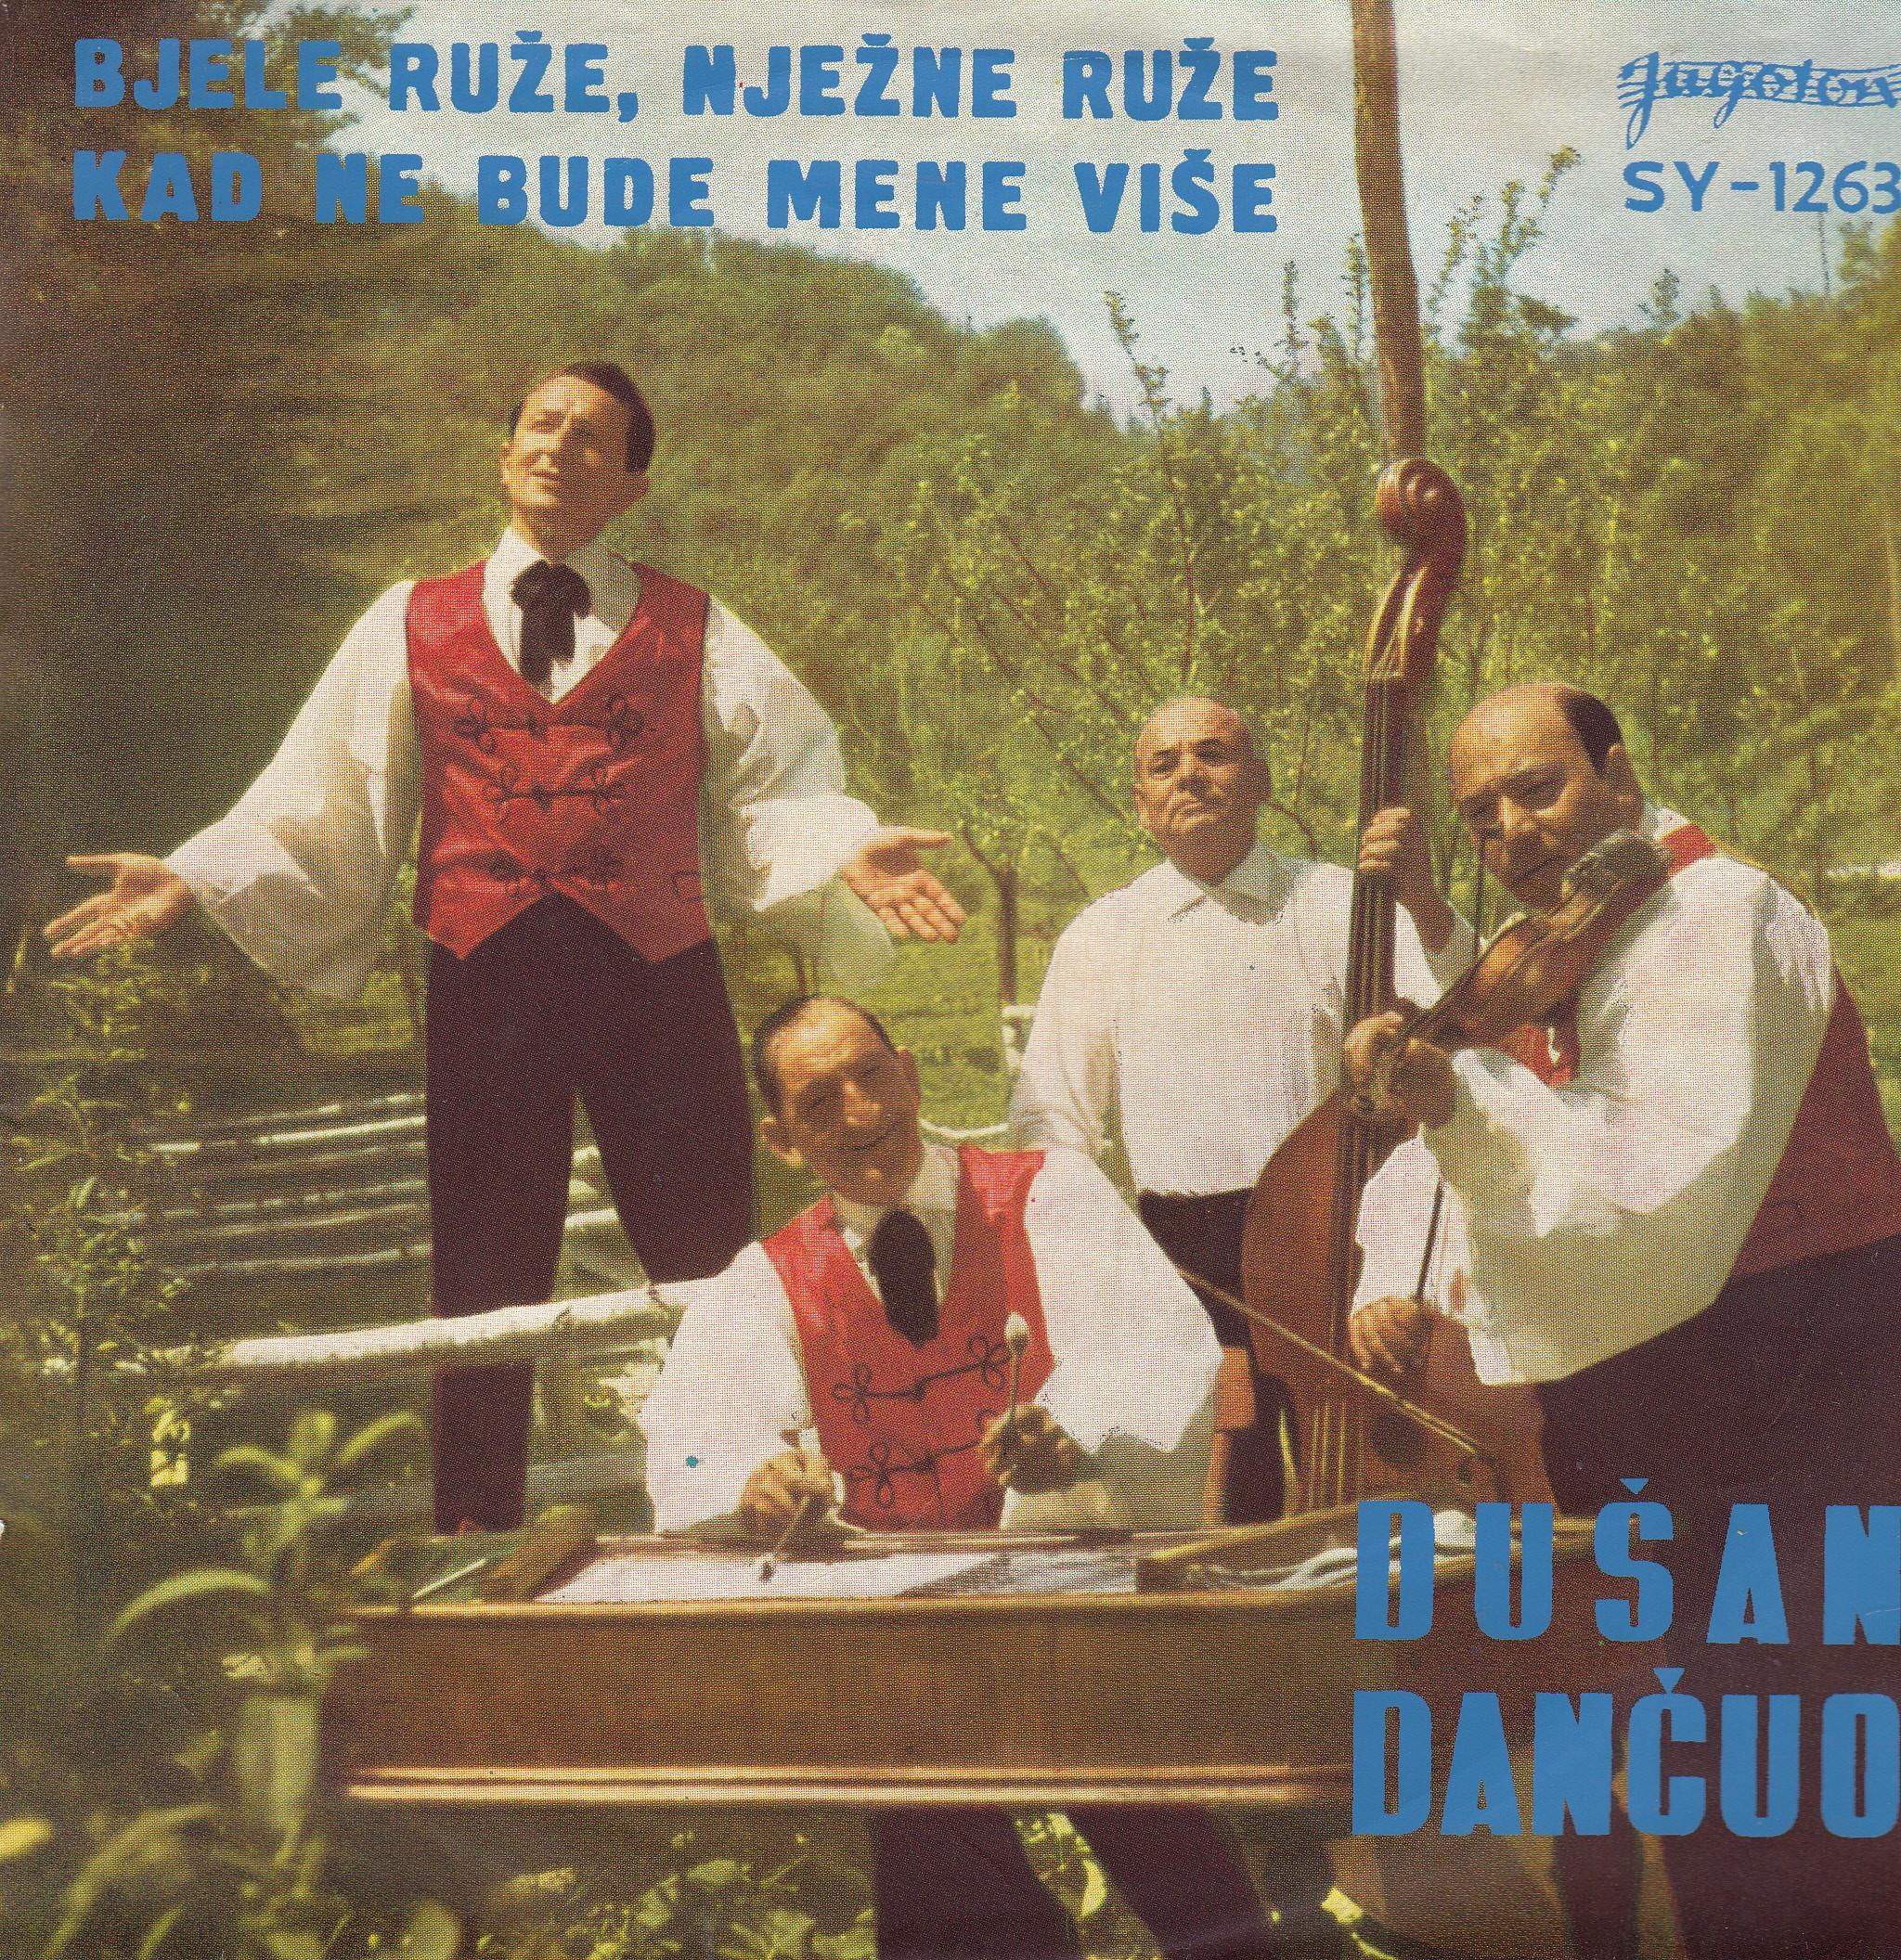 Dancuo Dusan - Bijele Ruze Njezne Ruze/kad Ne Bude Mene Vise